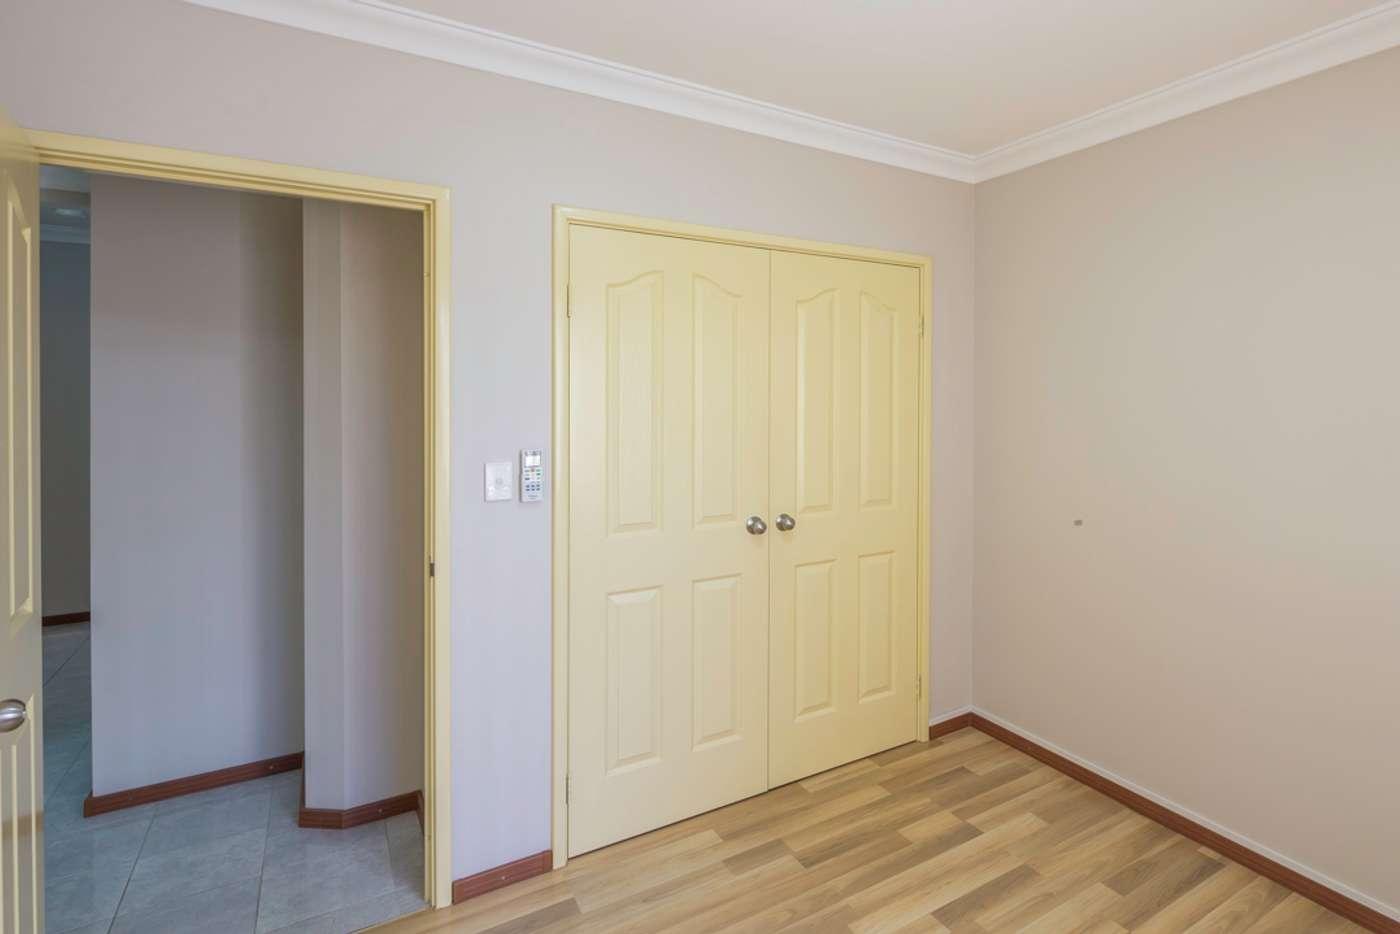 Sixth view of Homely unit listing, 10/32 Mason Street, Cannington WA 6107